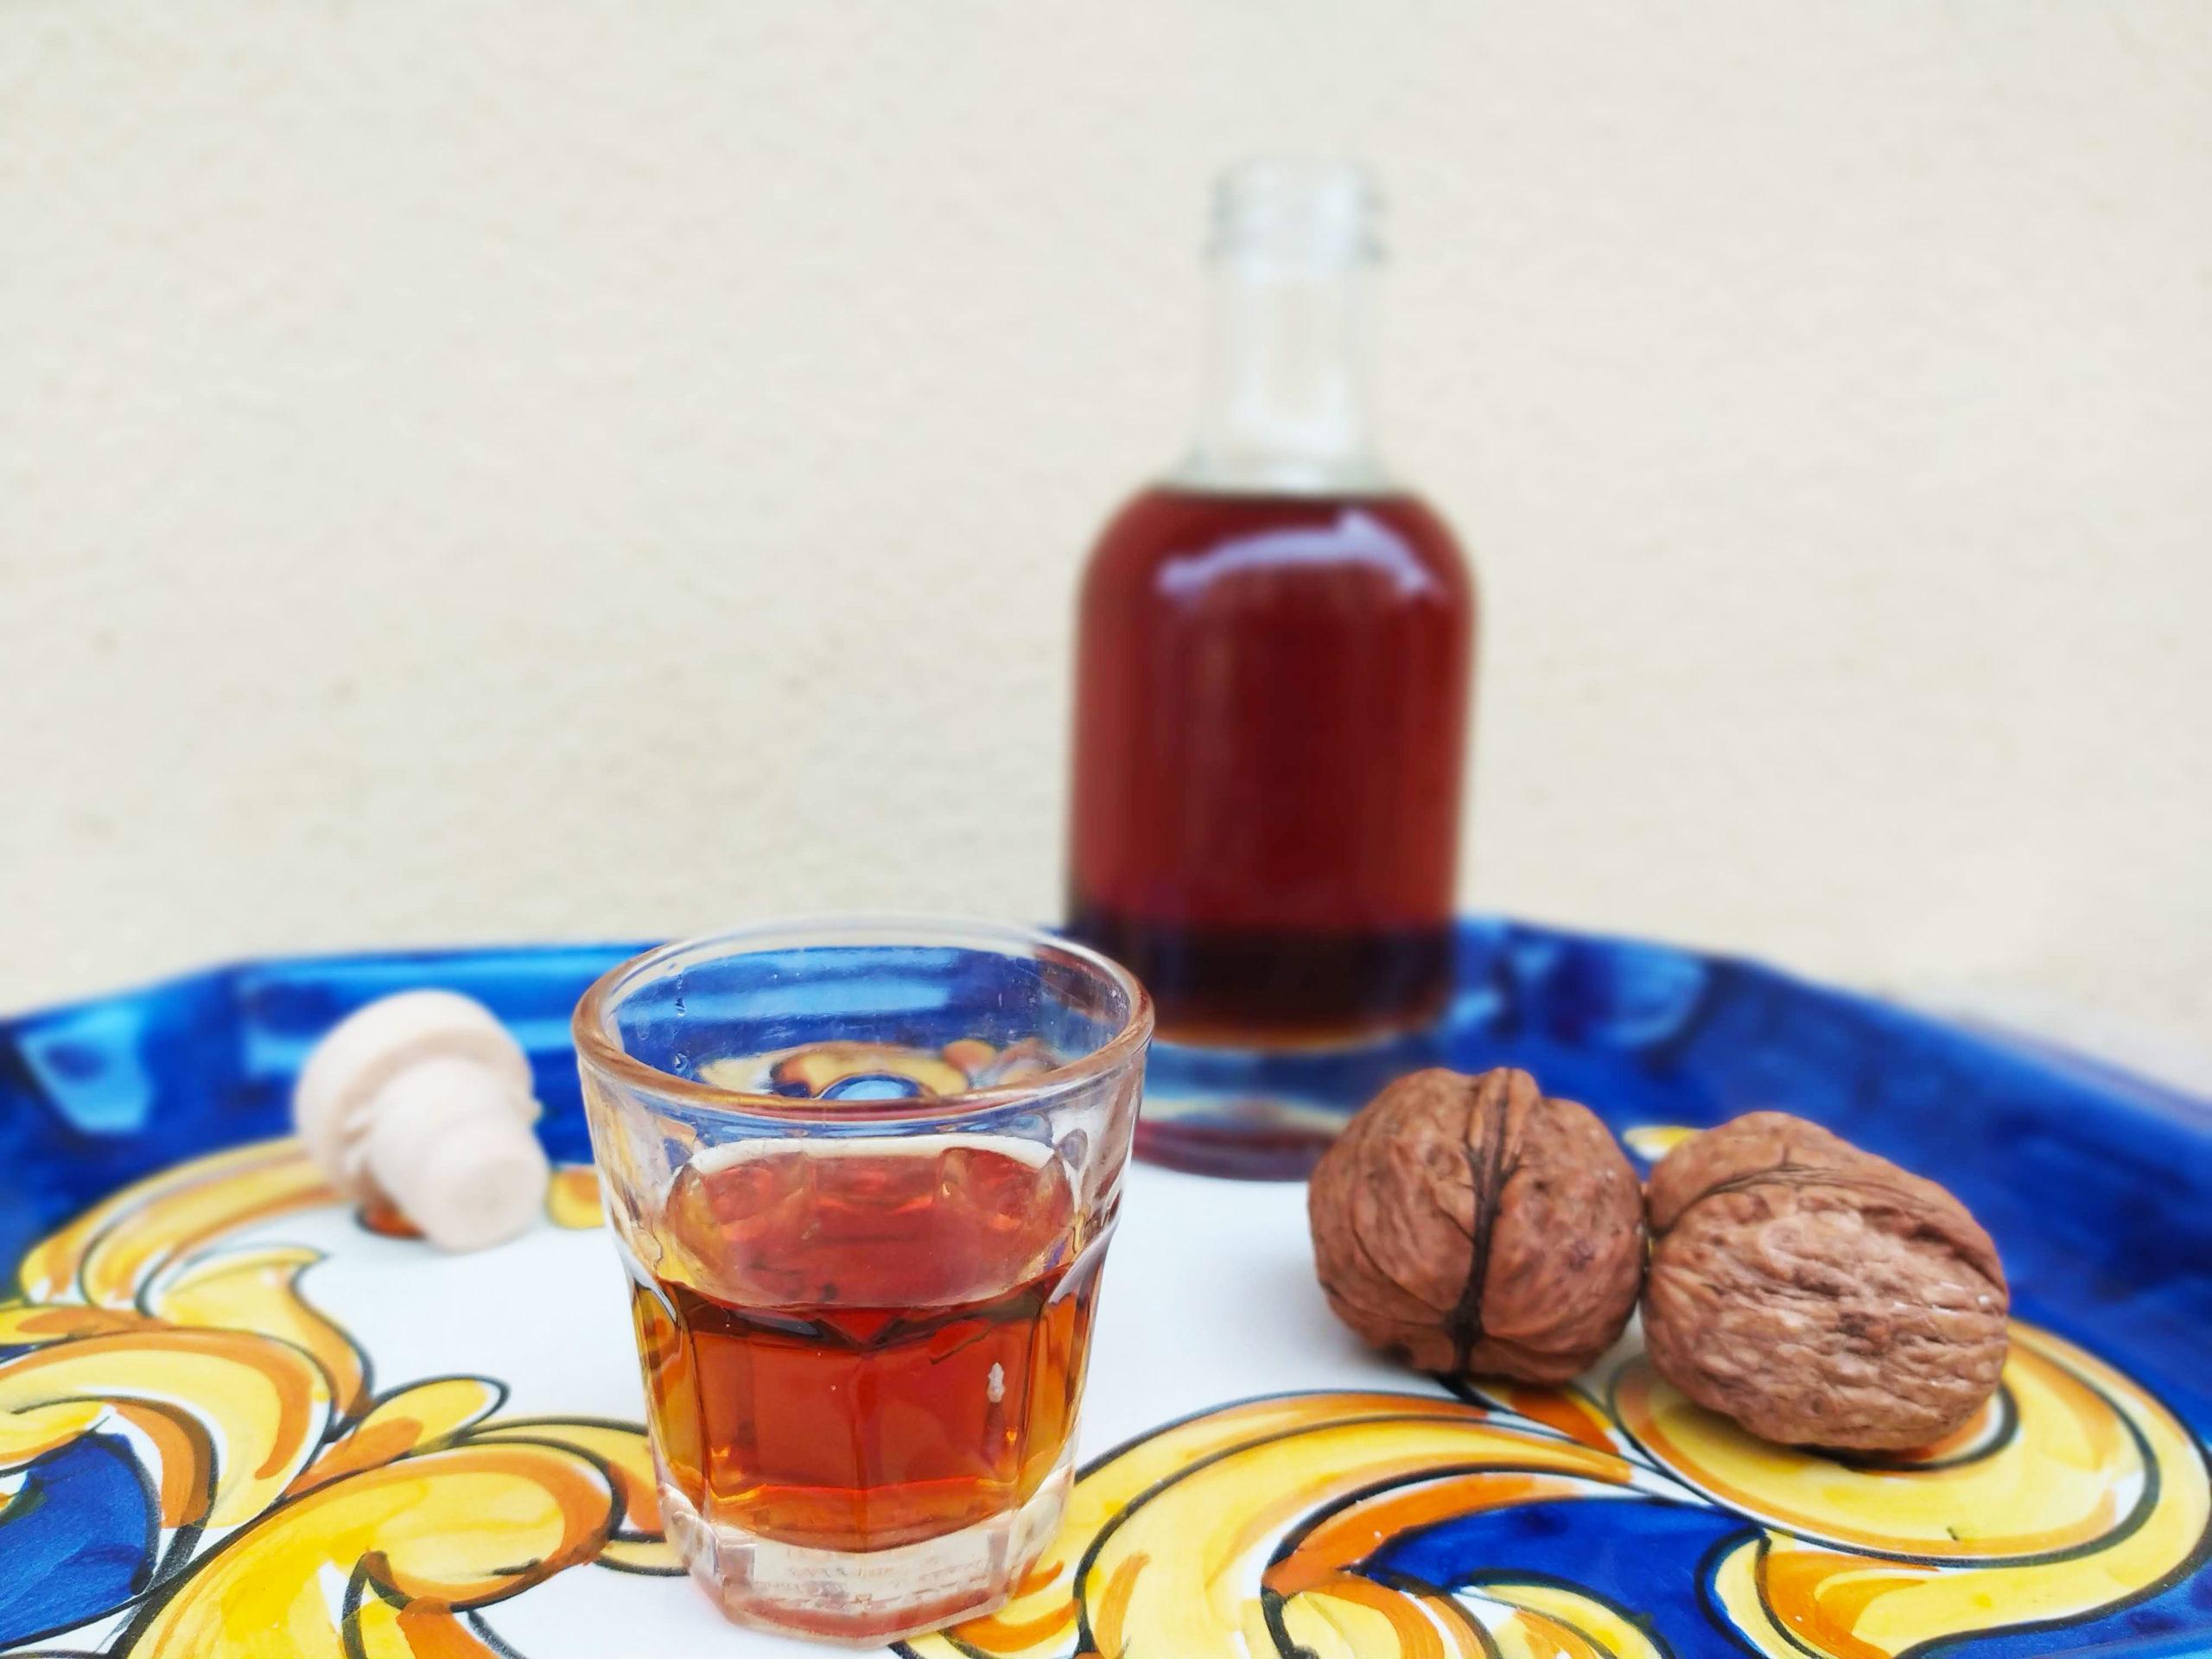 Nocino Italian Walnut Liqueur